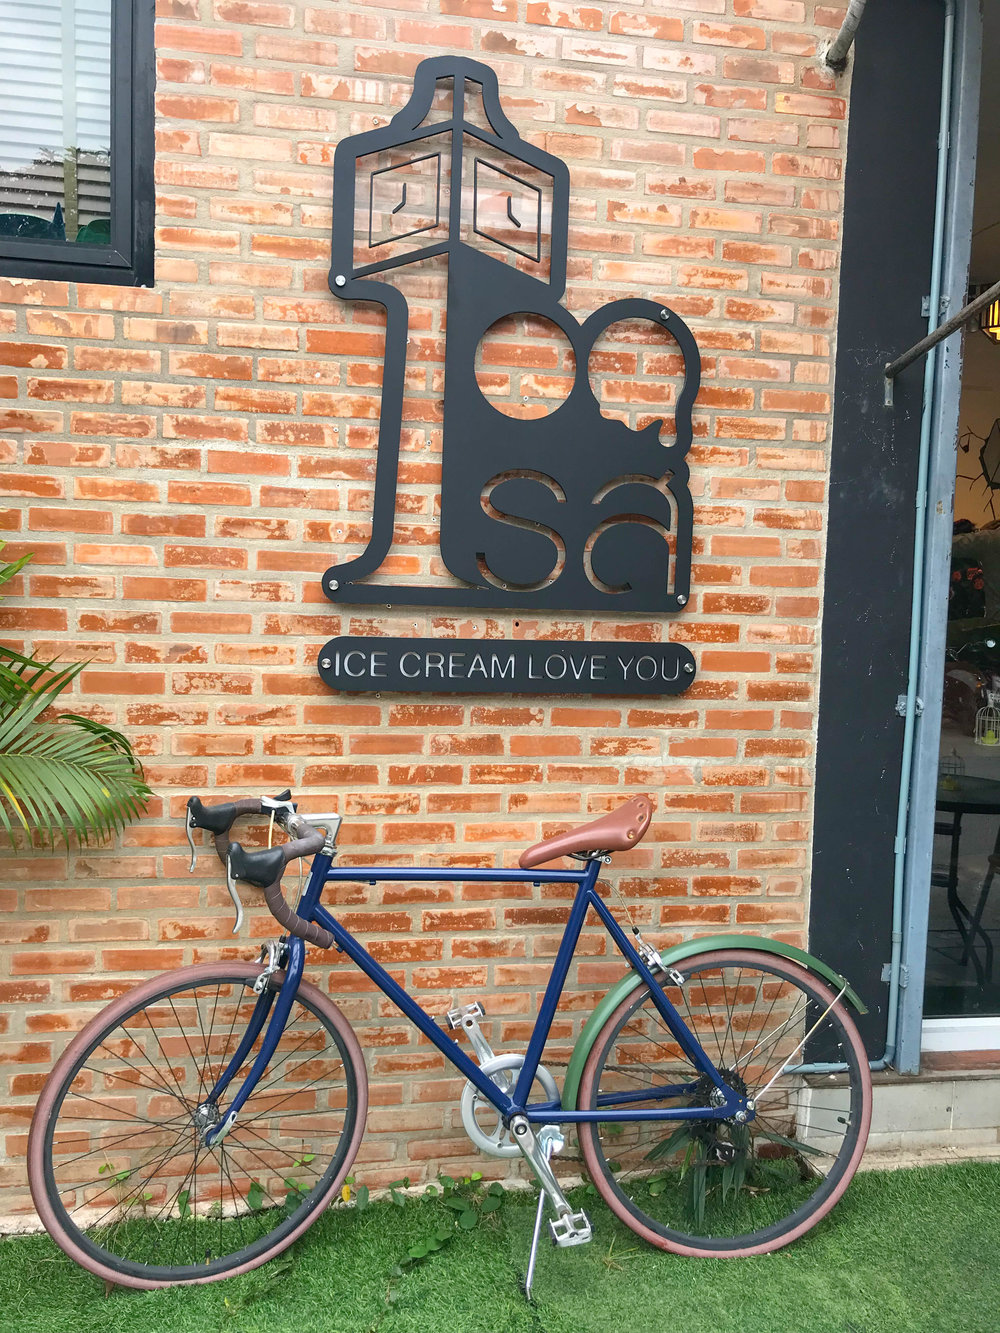 Ice Love You Chiang Mai Ice Cream bike